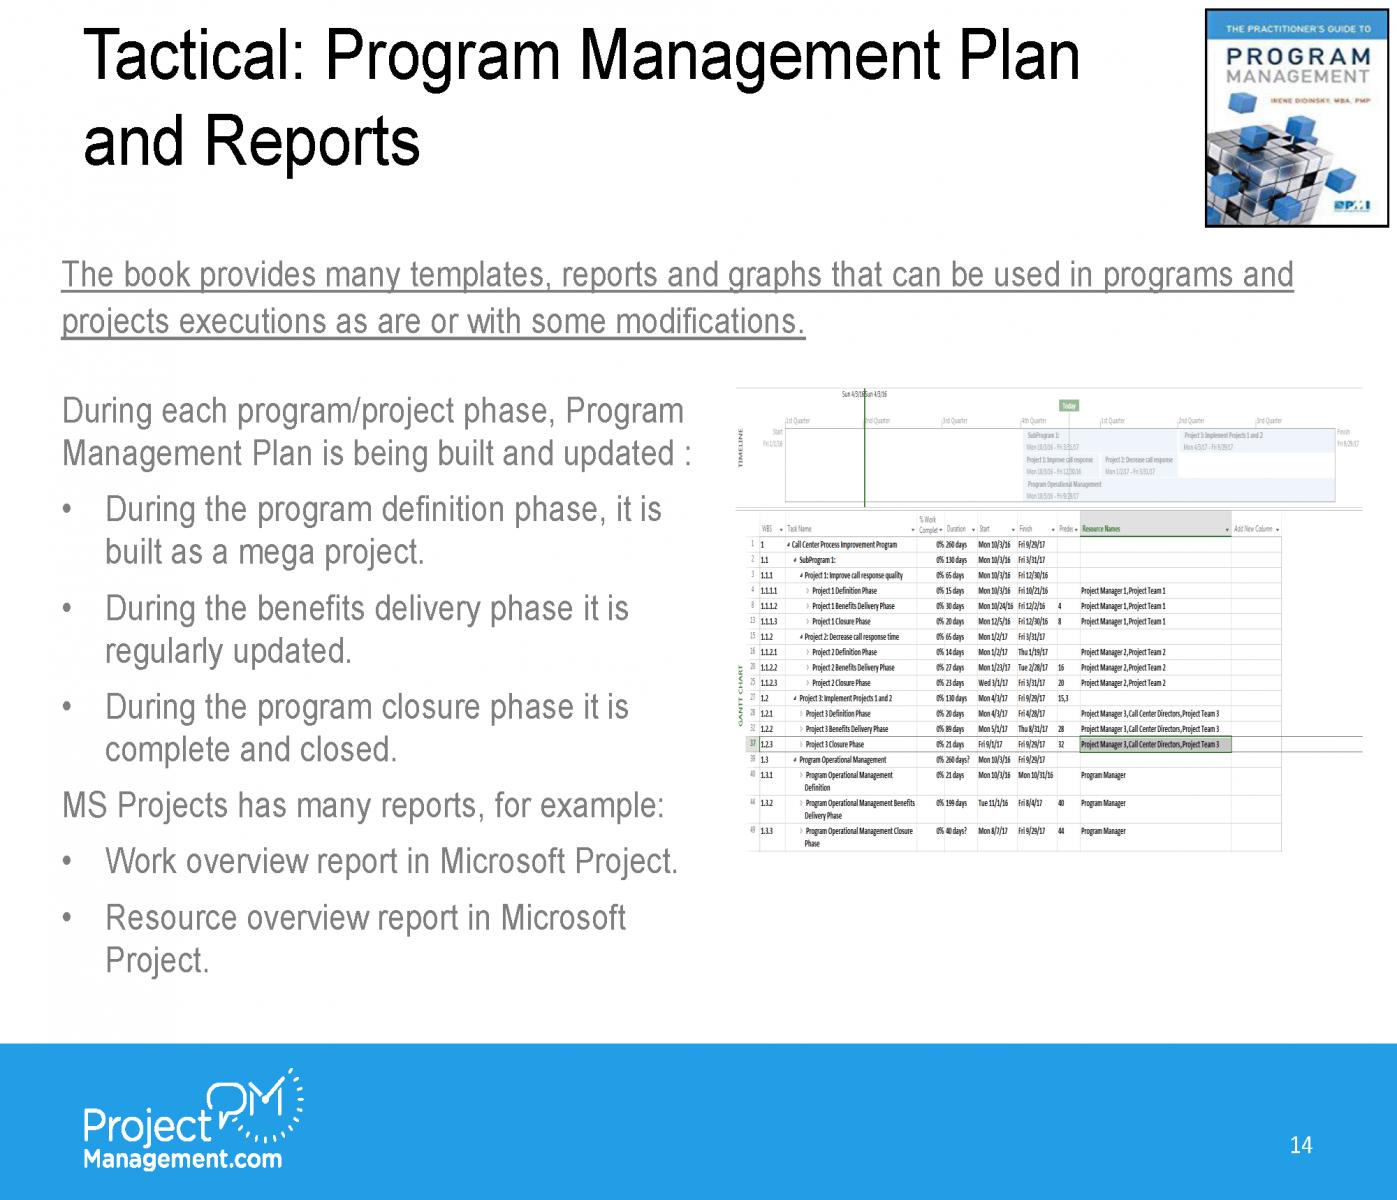 ProjectManagementcom webinar_Irene Didinsky_05112018_FinalFinal_Page_18